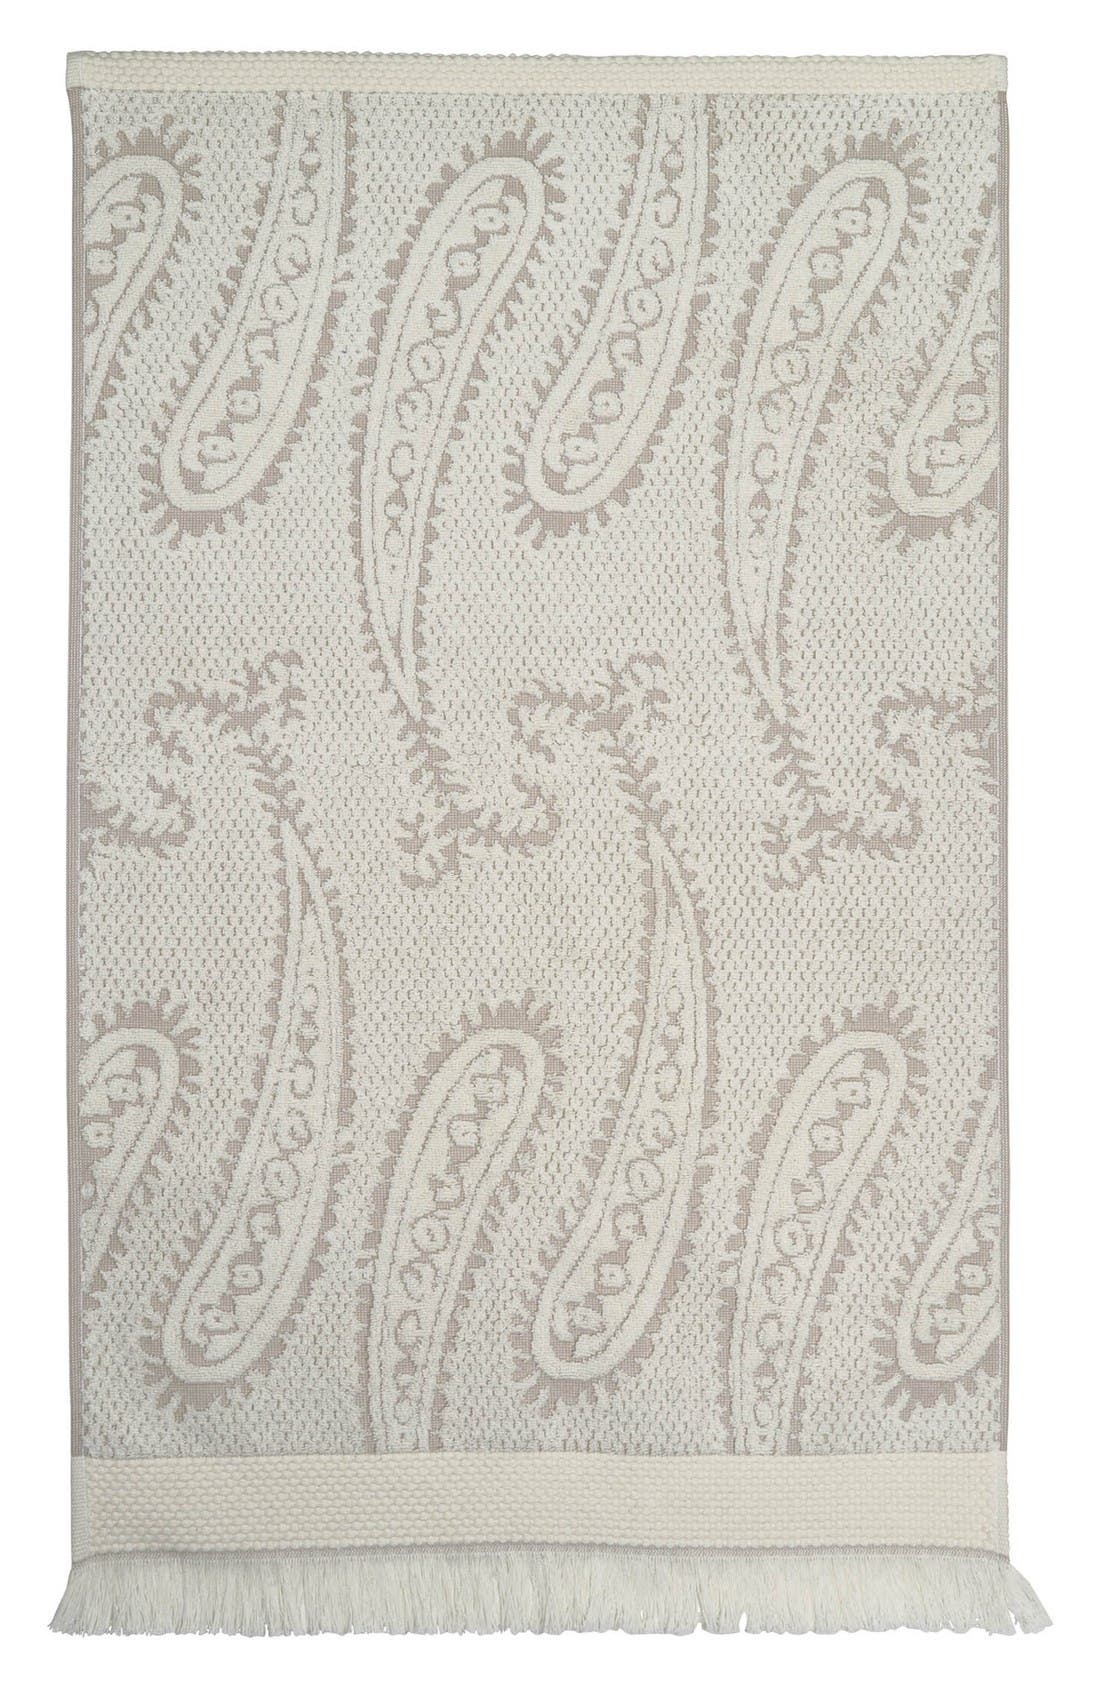 Alternate Image 1 Selected - John Robshaw Naji Hand Towel